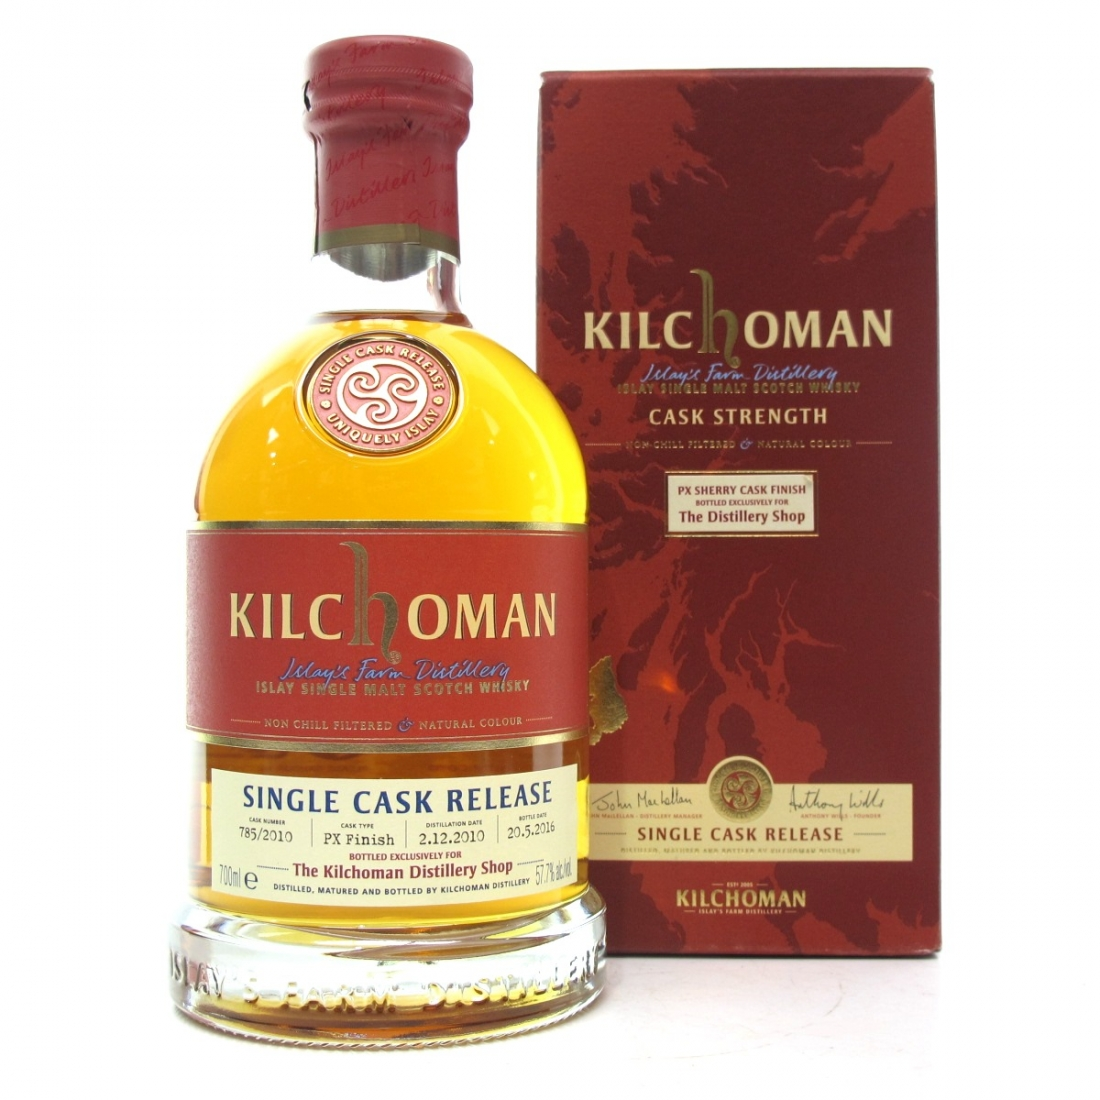 Kilchoman 2010 Single Cask PX Finish / Distillery Exclusive